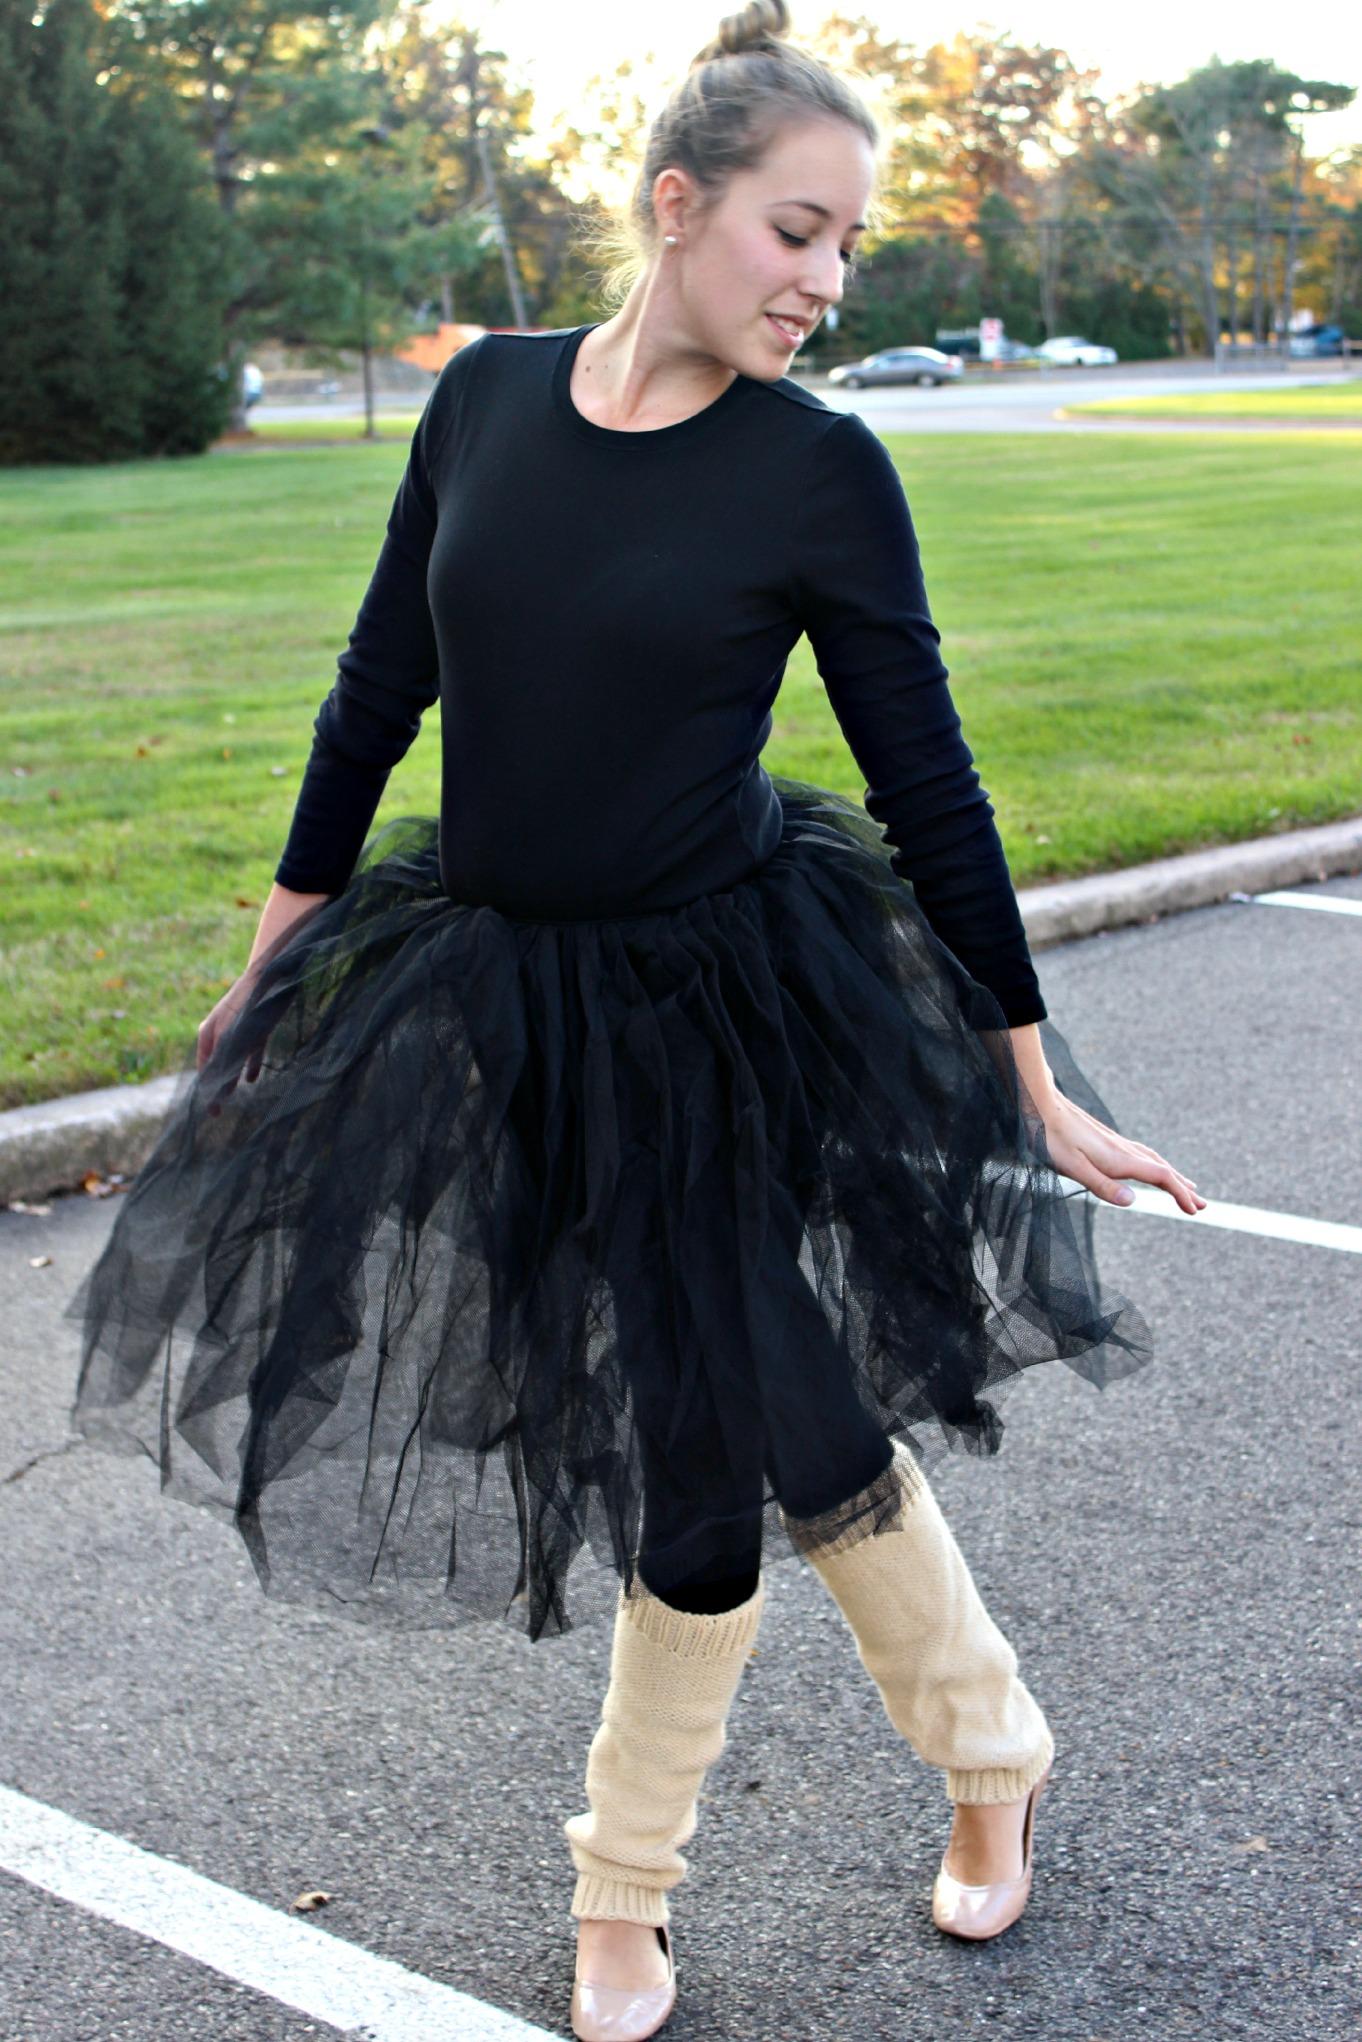 The Black Ballerina